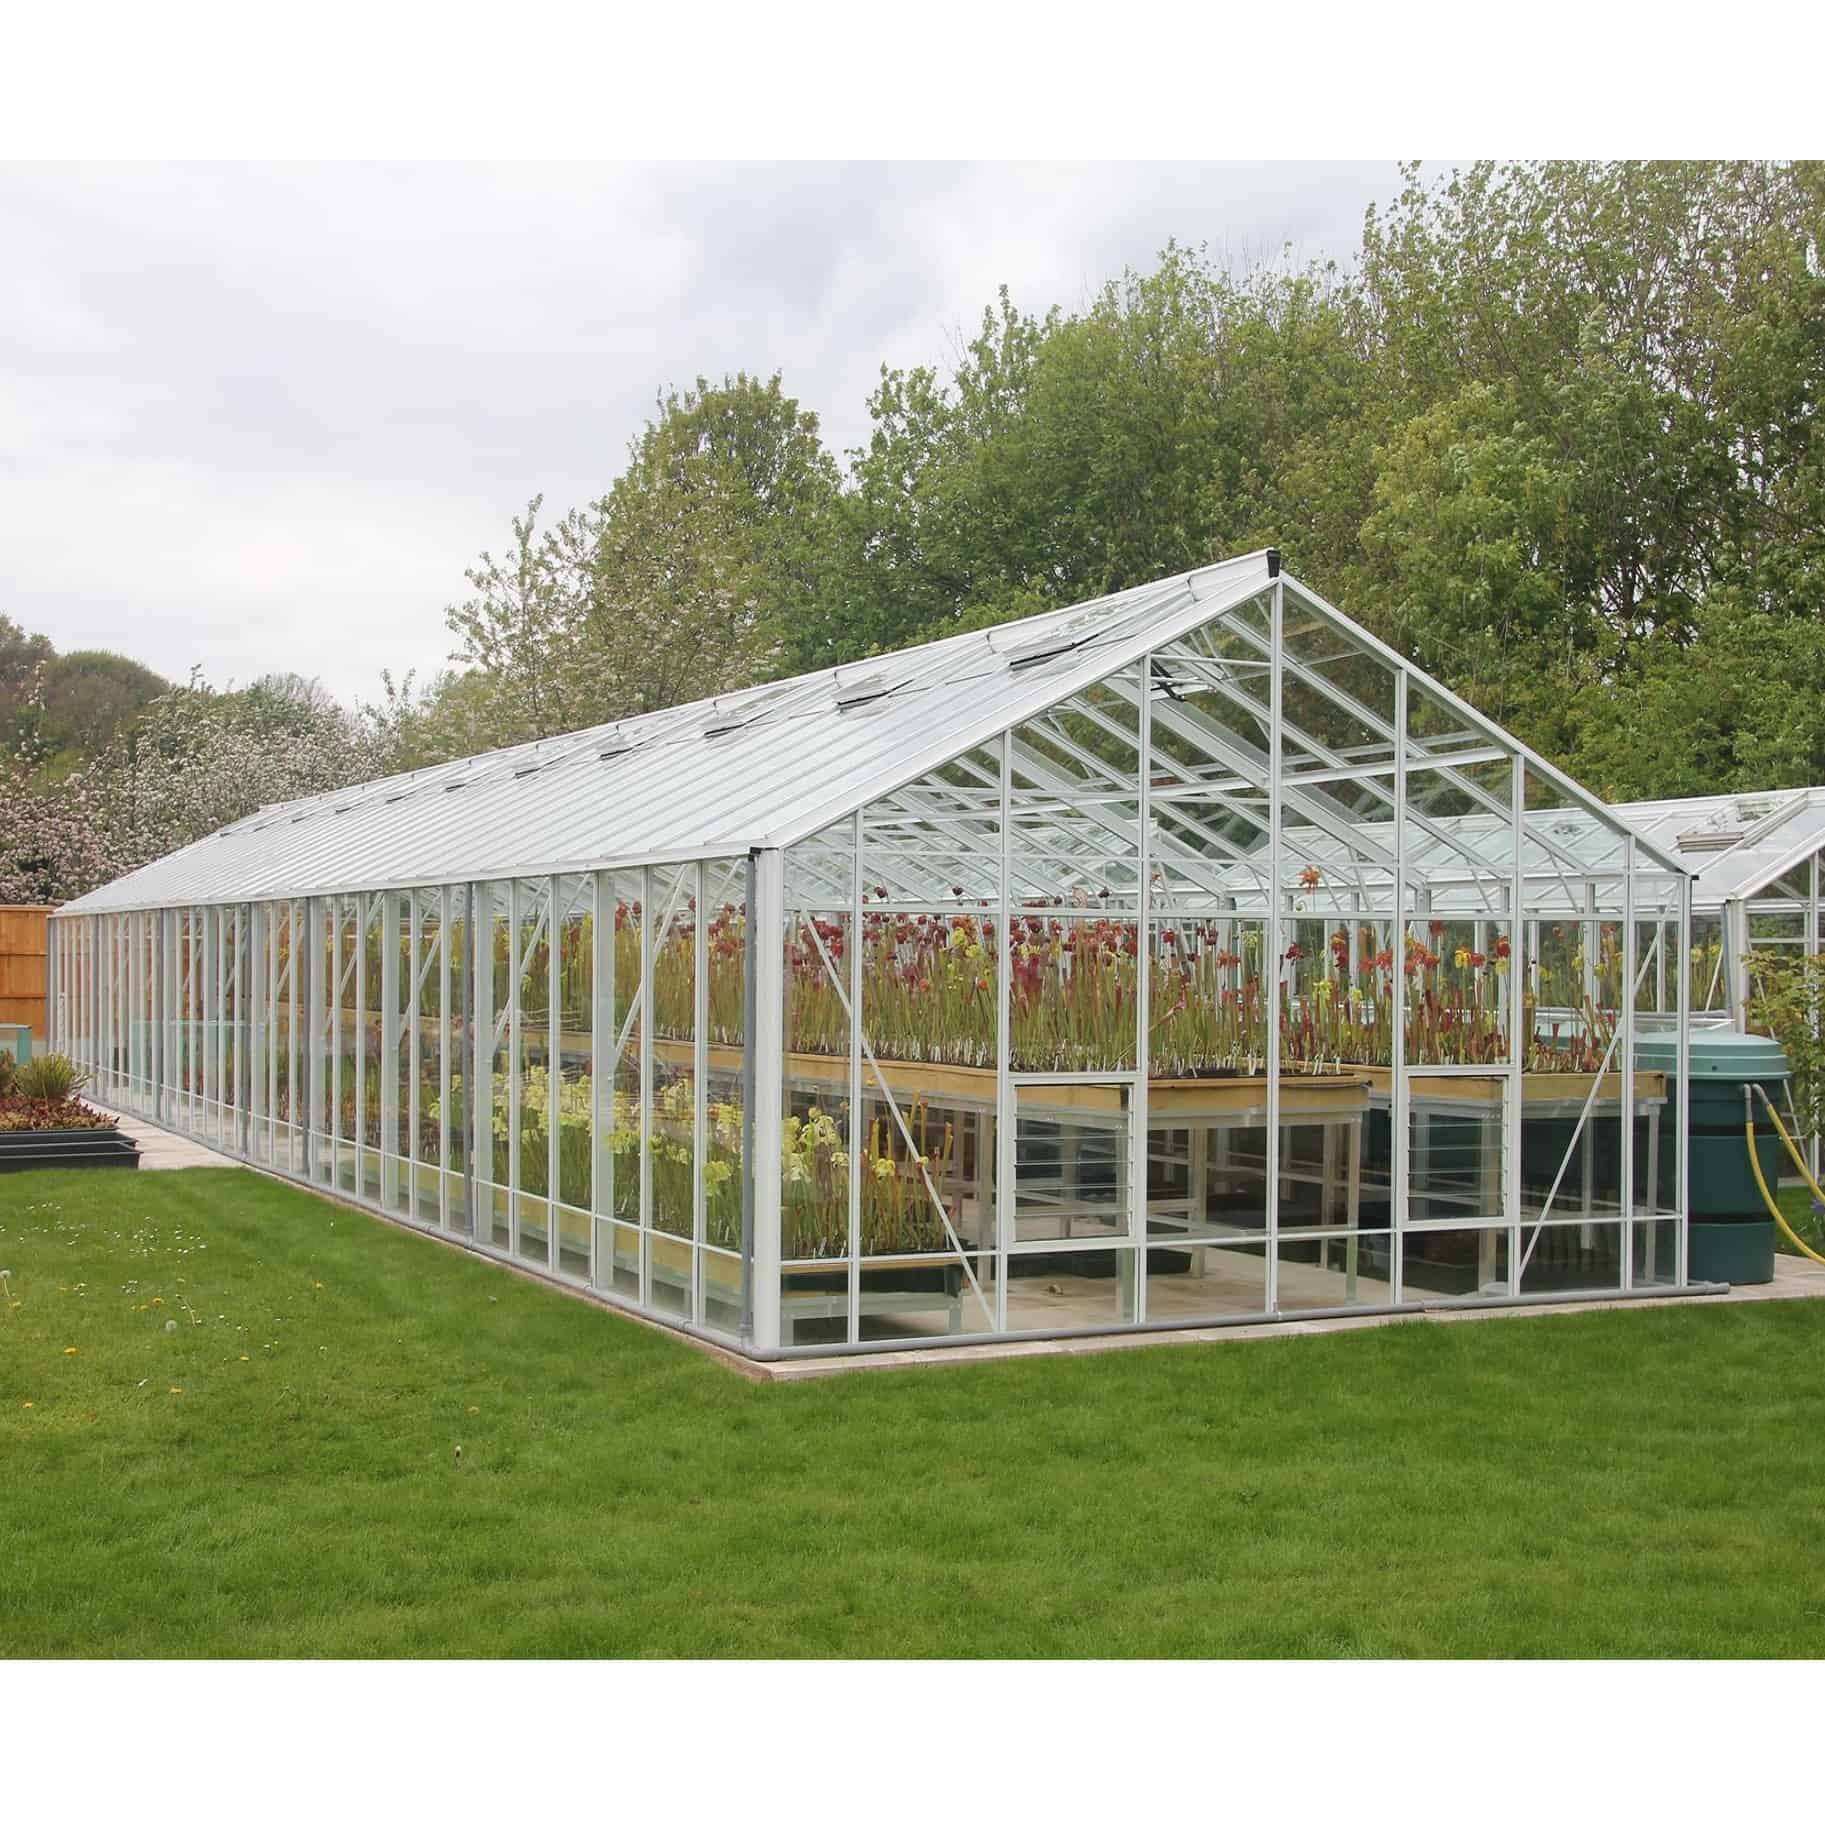 Renown Greenhouse By Robinsons Berkshire Garden Buildings